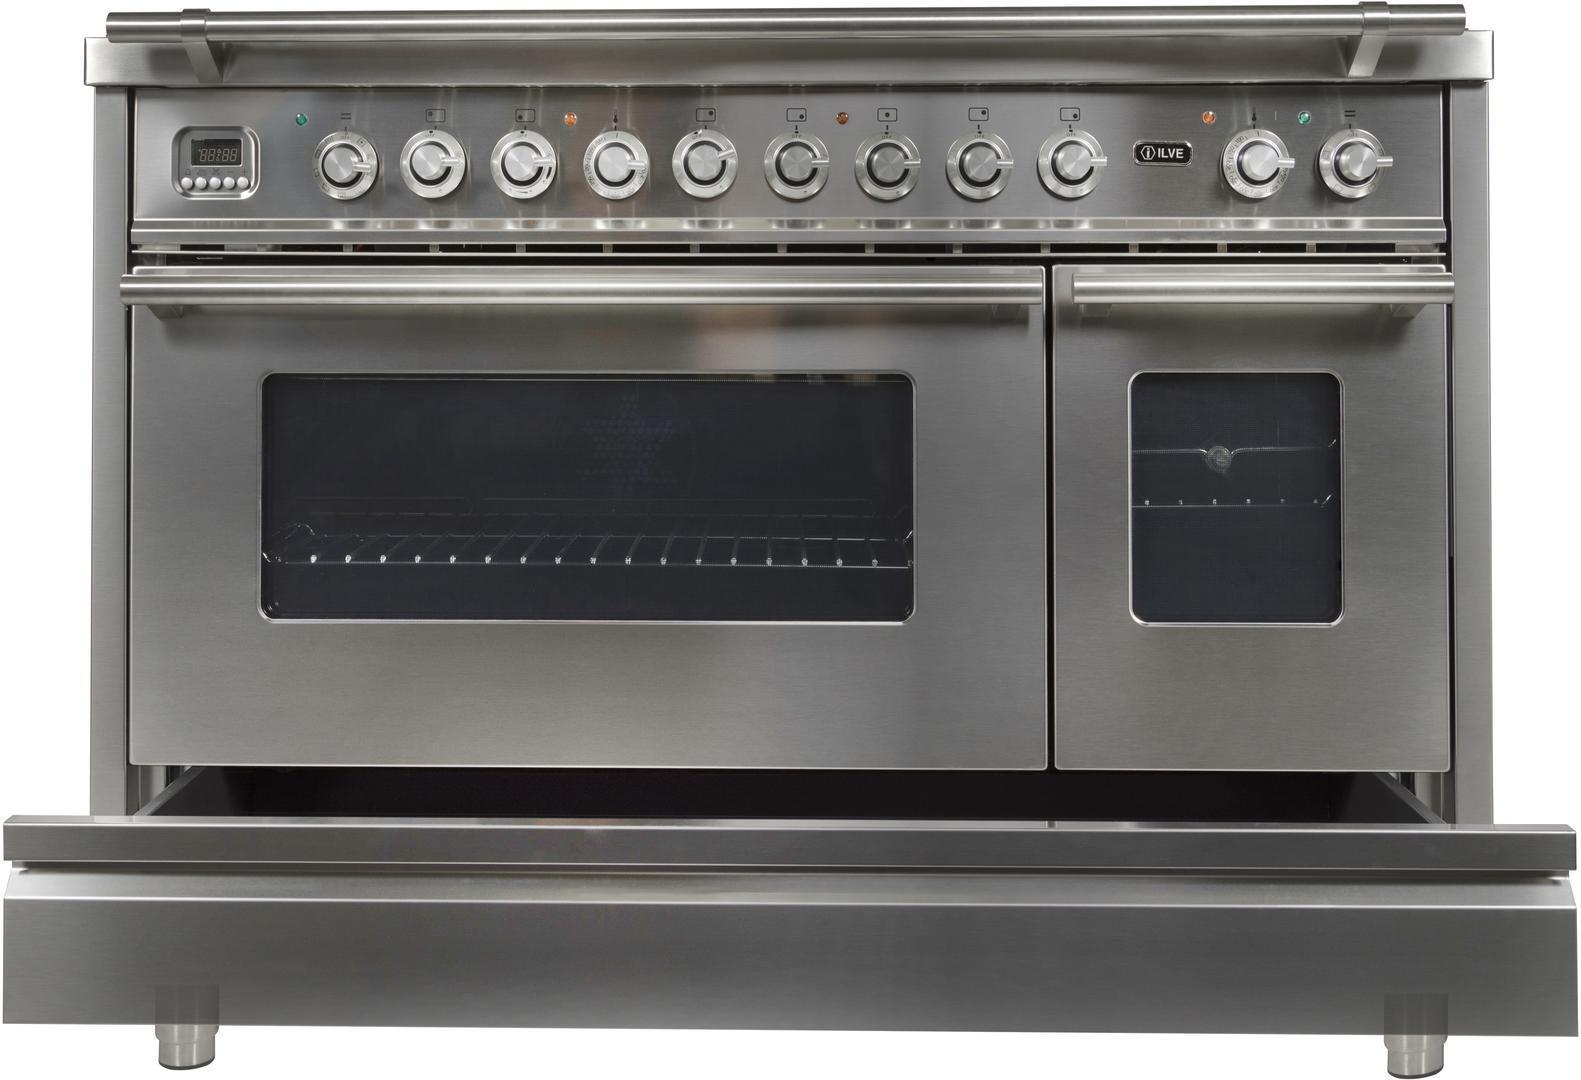 Ilve Professional Plus UPW120FDMPILP Freestanding Dual Fuel Range Stainless Steel, UPW120FDMPILP Dishwarming Drawer